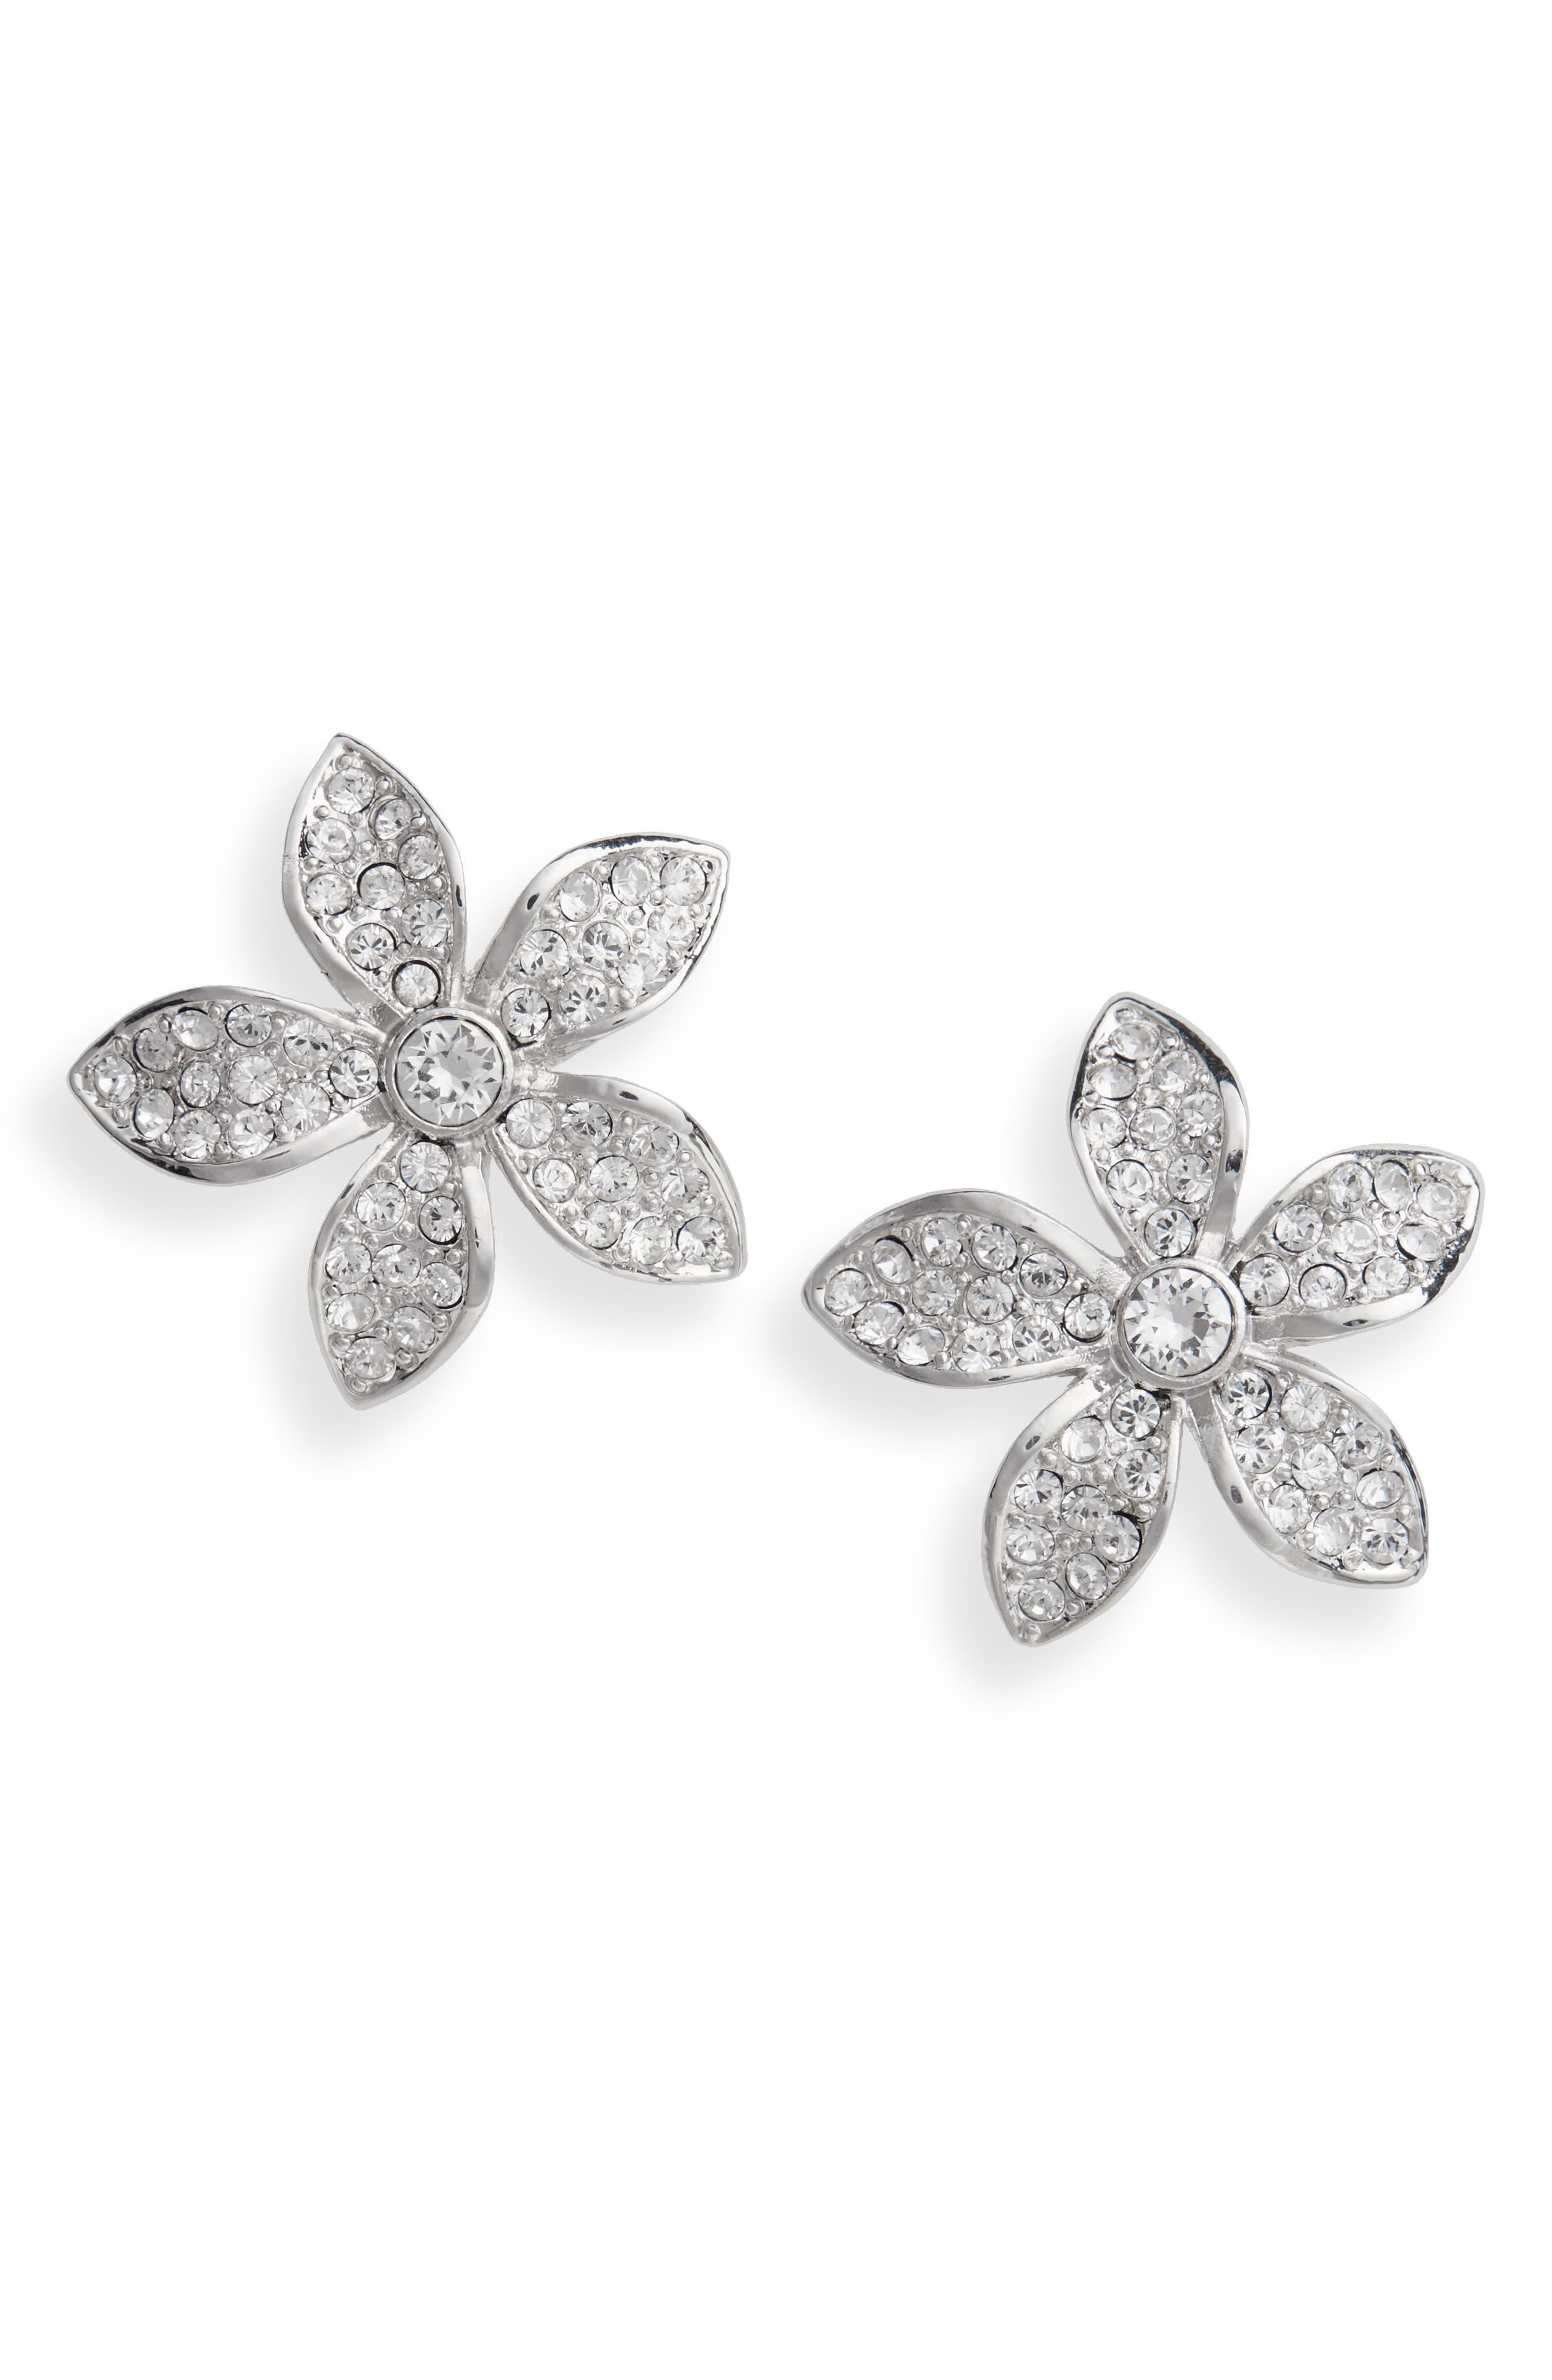 Floral Crystal Stud Earrings,                         Main,                         color, 042